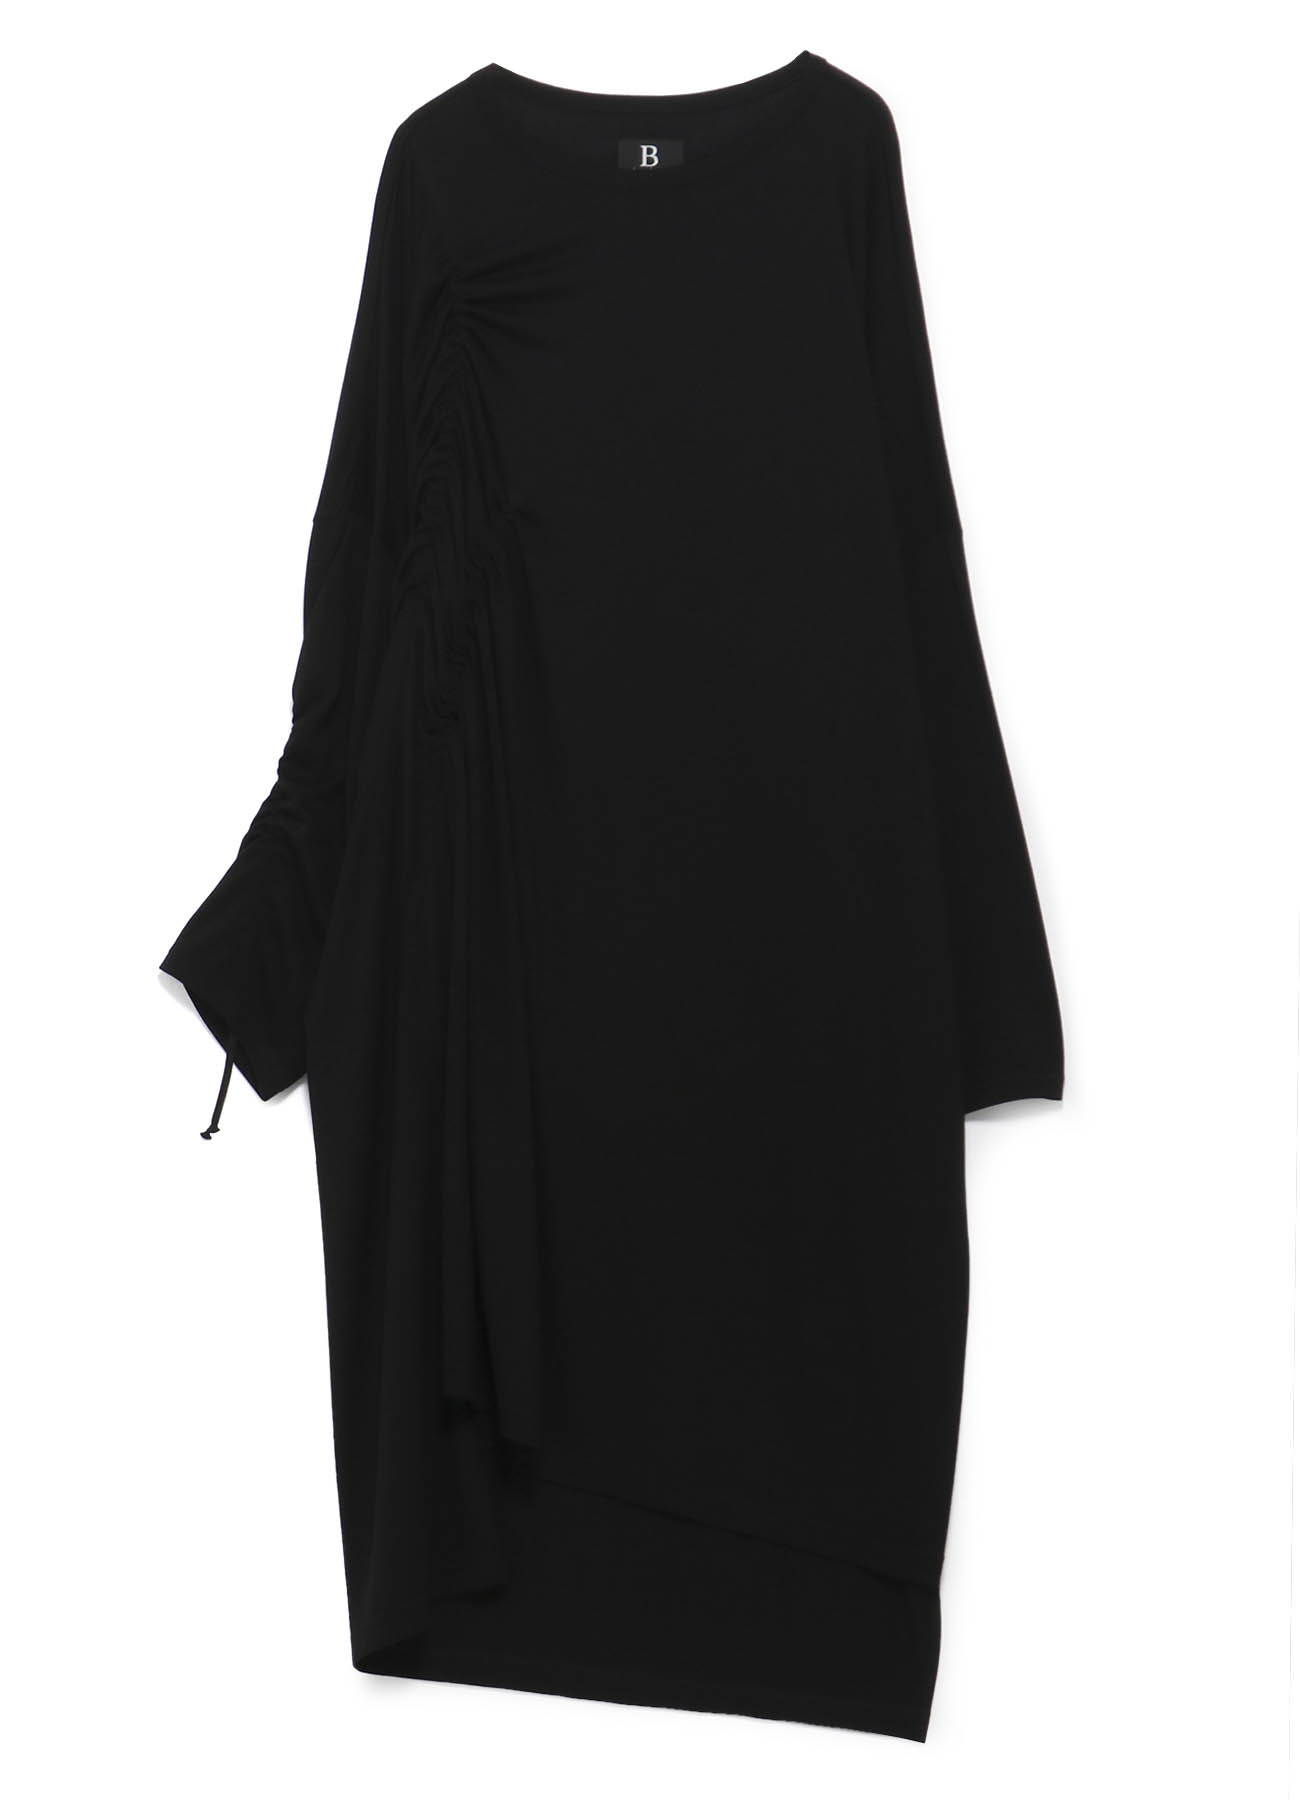 B/Rexcell Wool Drawstring Dress